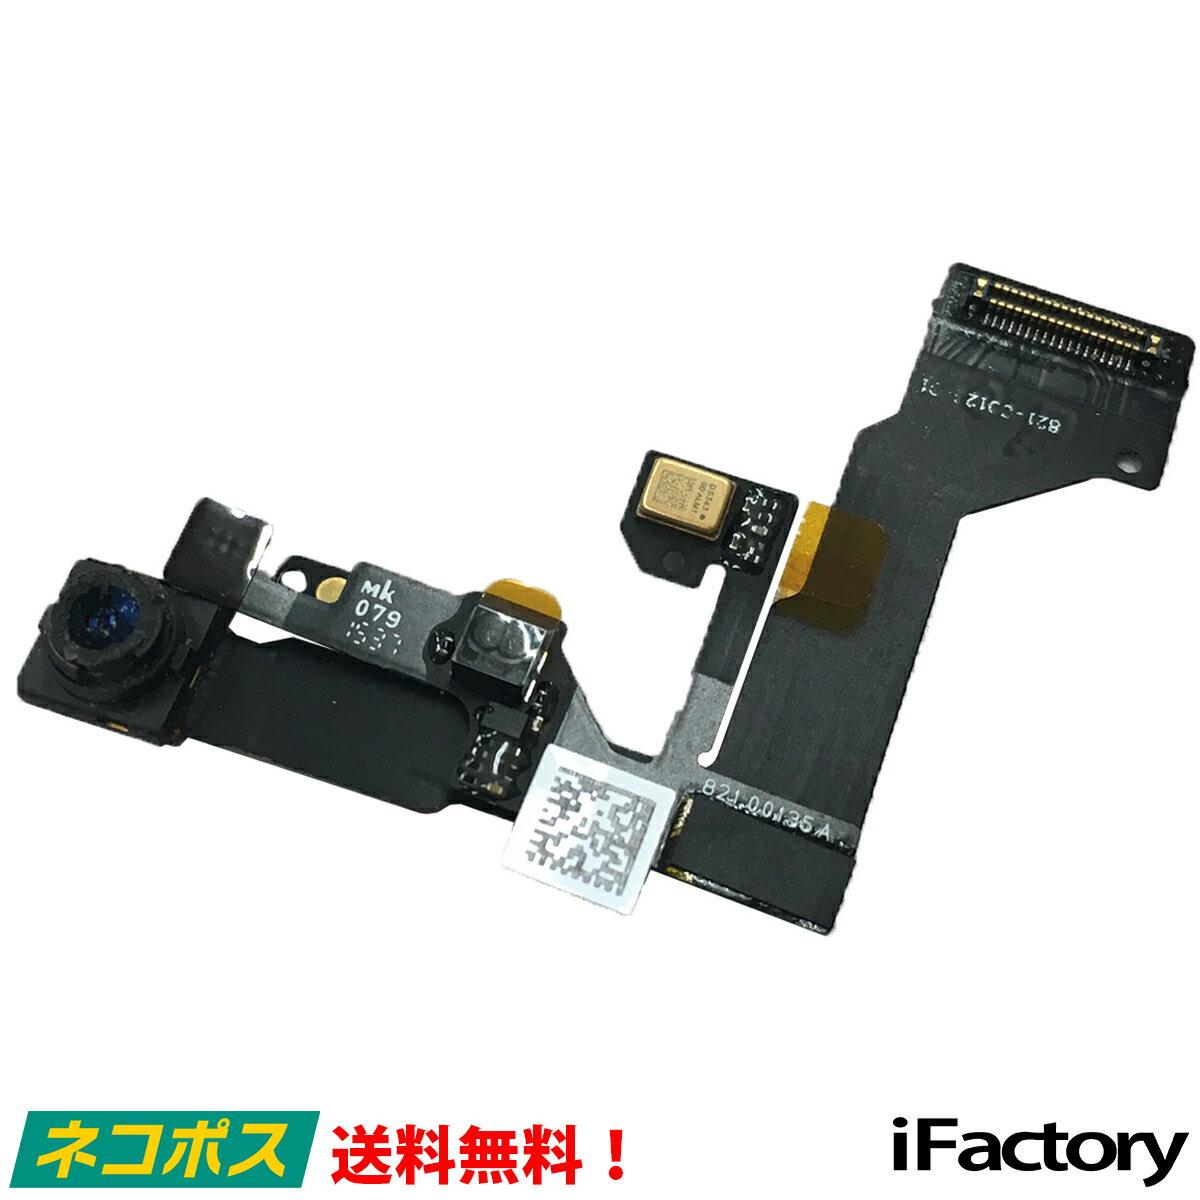 iPhone6s 近接センサー/フロントカメラ 修理 交換用リペアパーツ